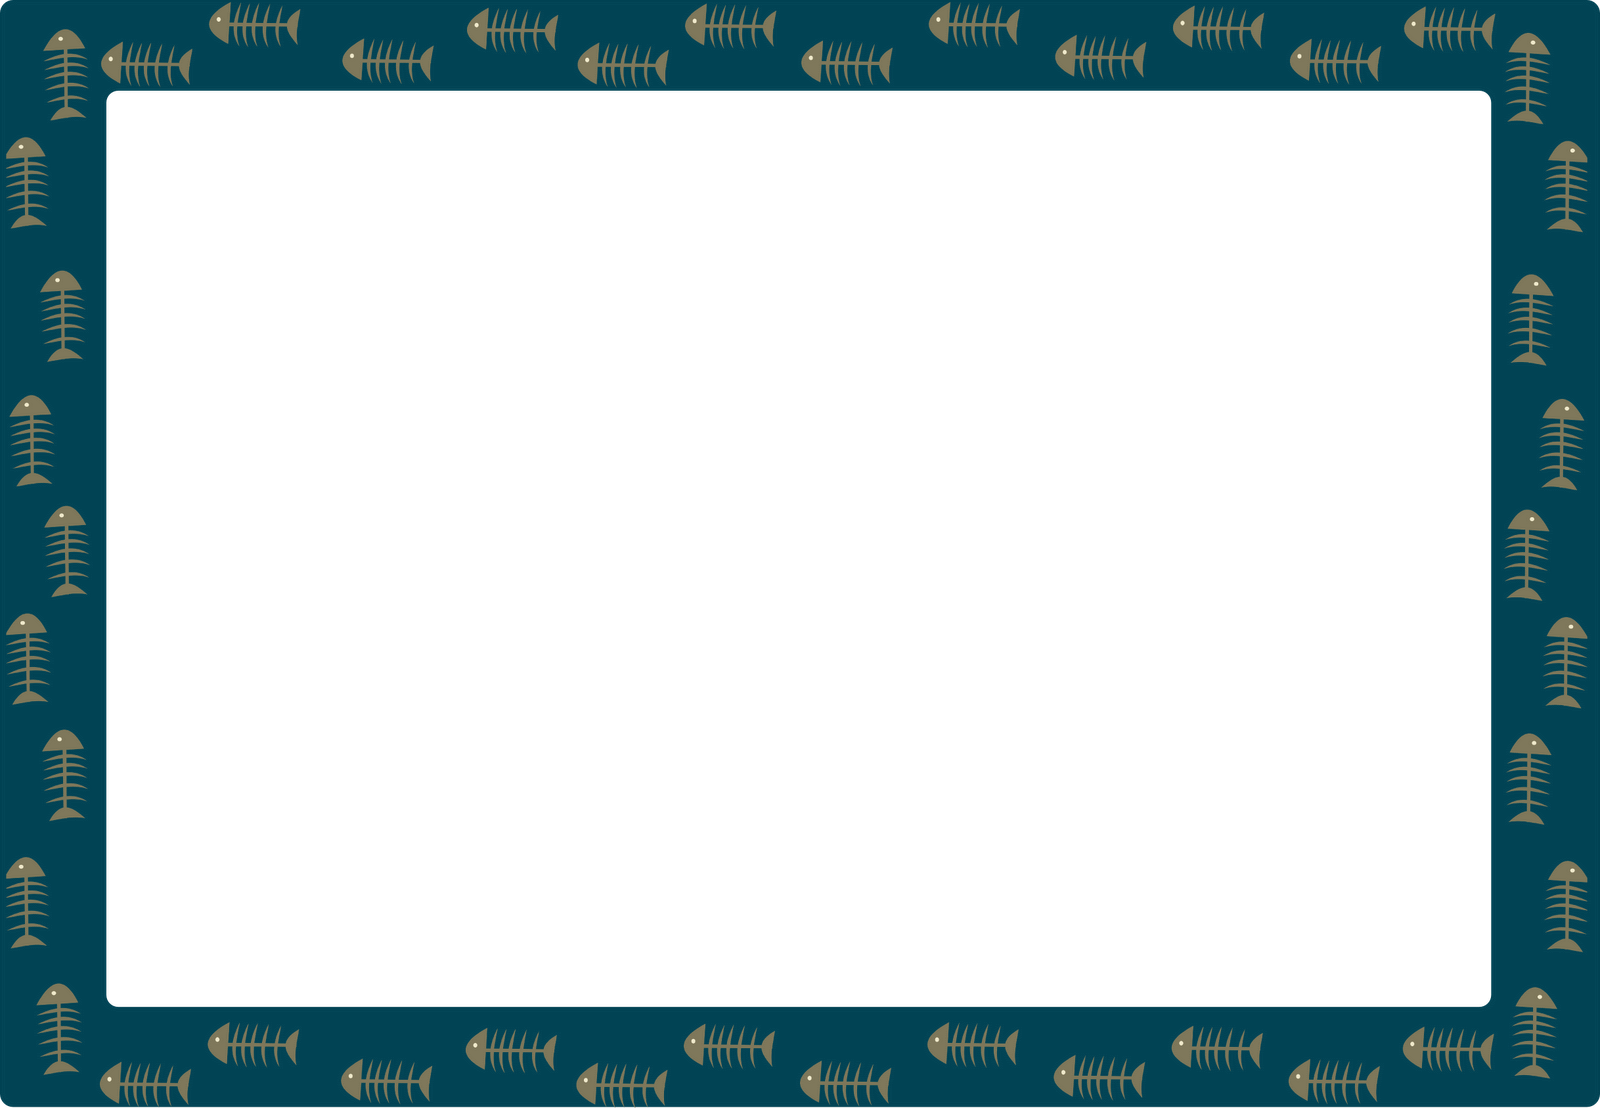 Free Cat Images: free fishbone frame and border for cat blog design ...